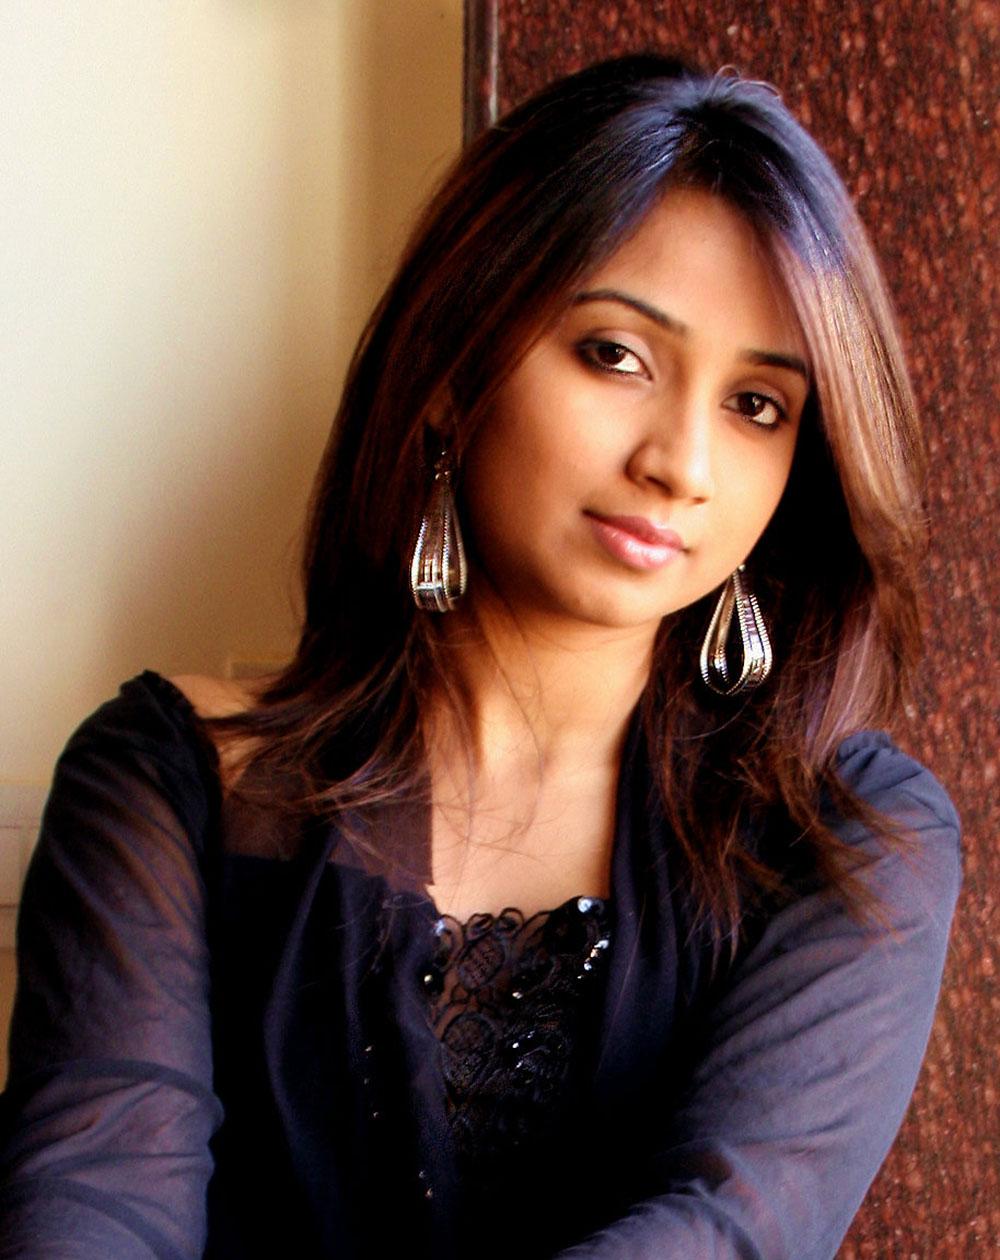 shreya ghosal beautiful look - photo #32